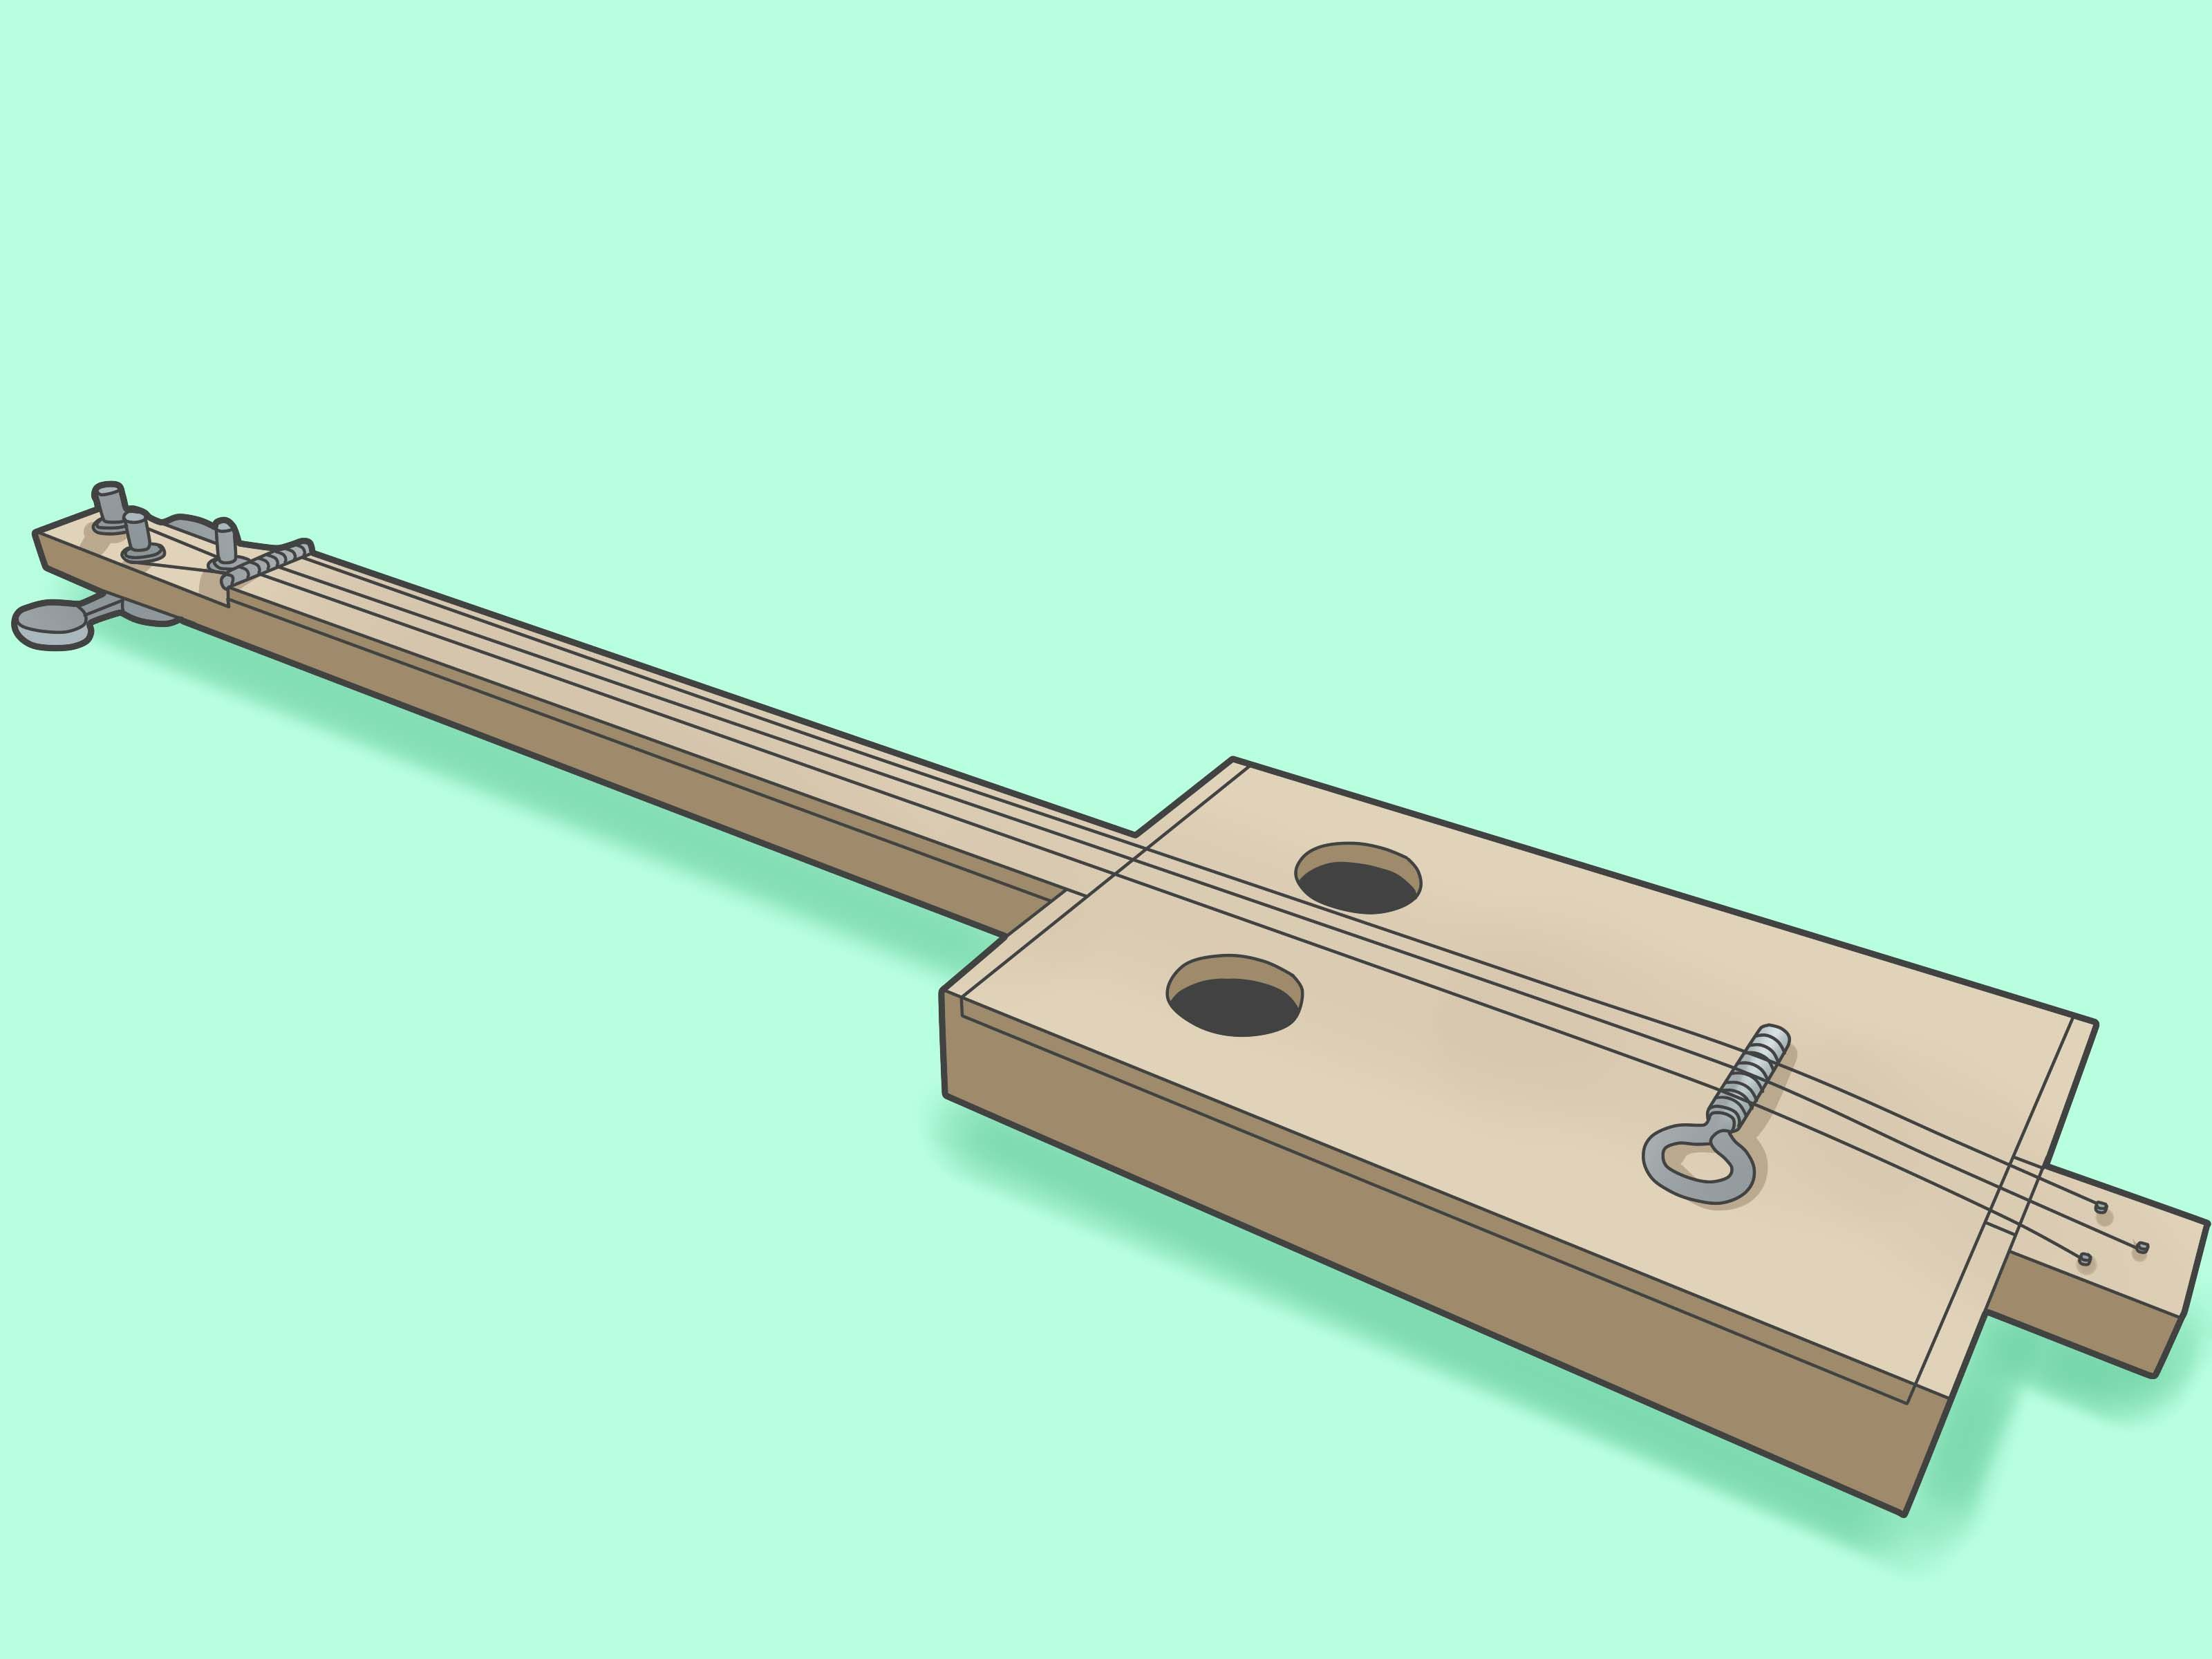 construir una guitarra de caja de puros sencilla | Pinterest | Cajas ...